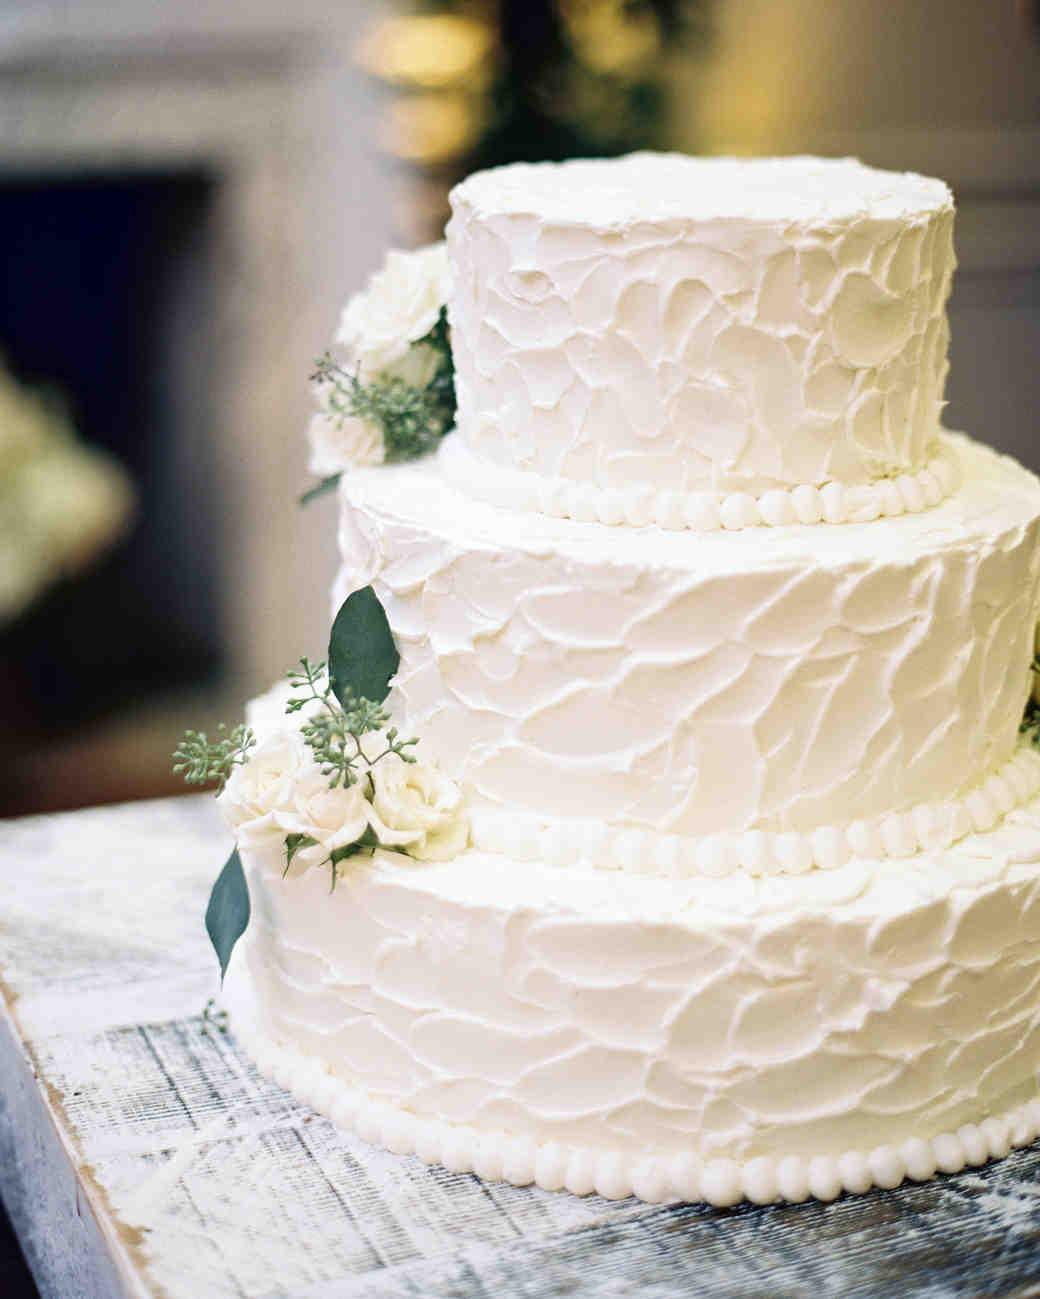 White Wedding Cake  104 White Wedding Cakes That Make the Case for Going